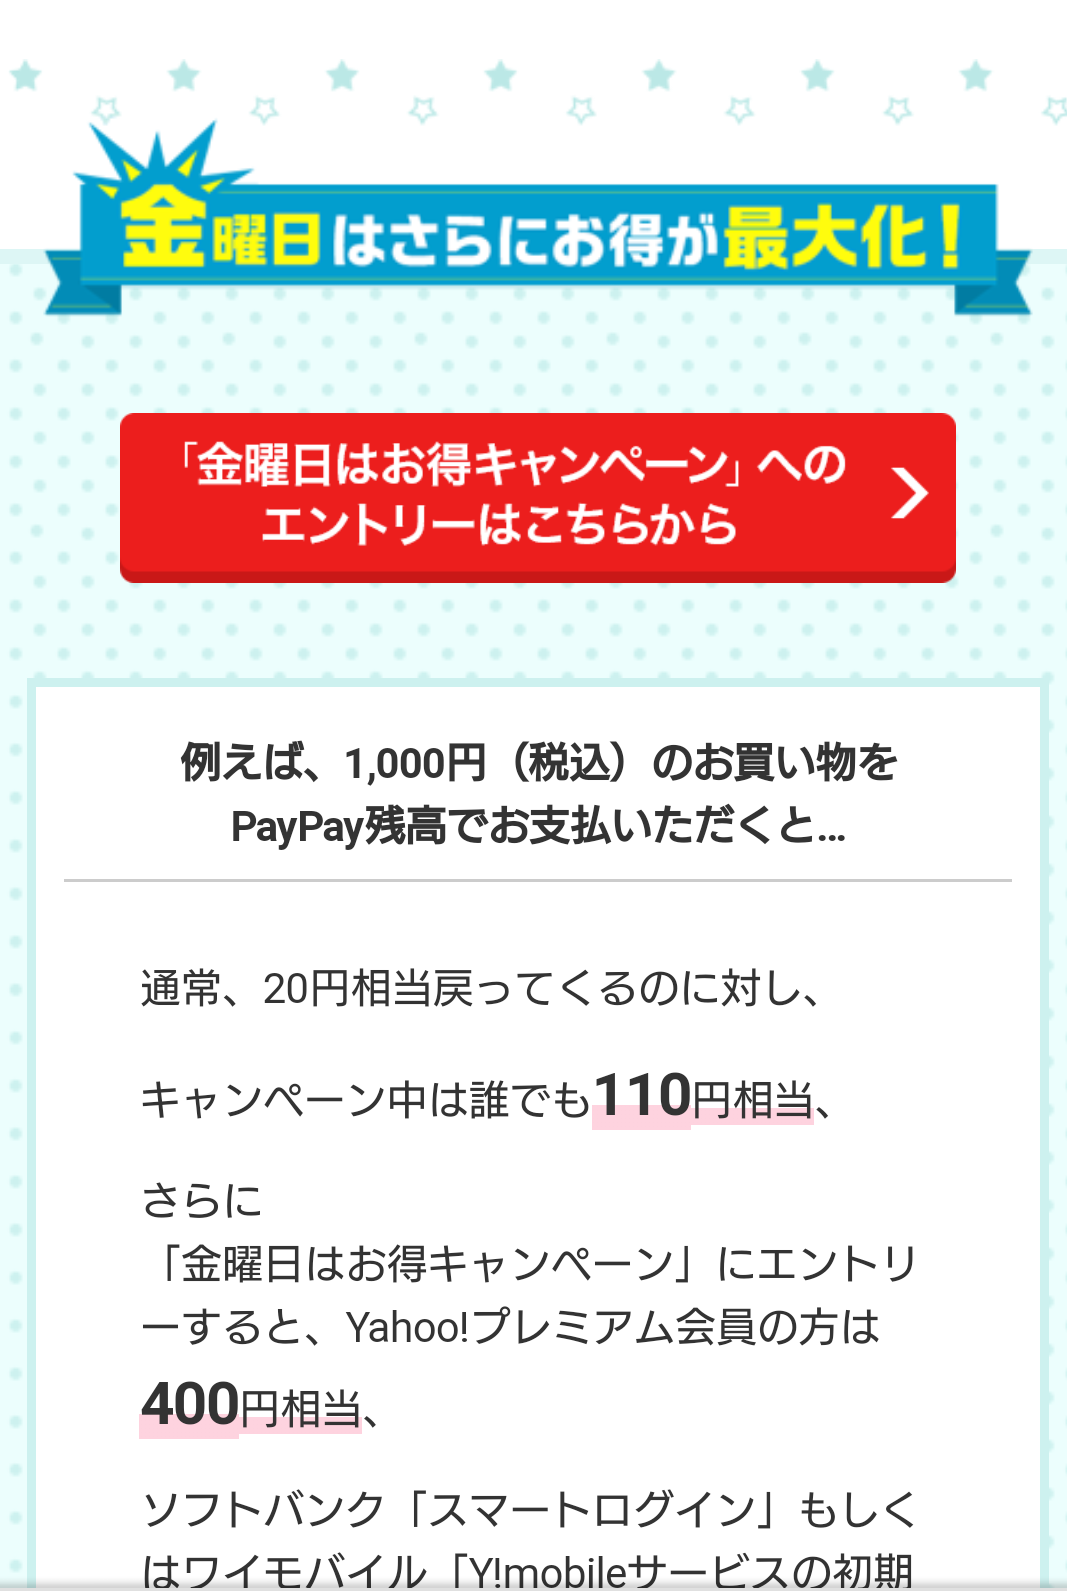 ebookjapan 金曜日キャンペーン